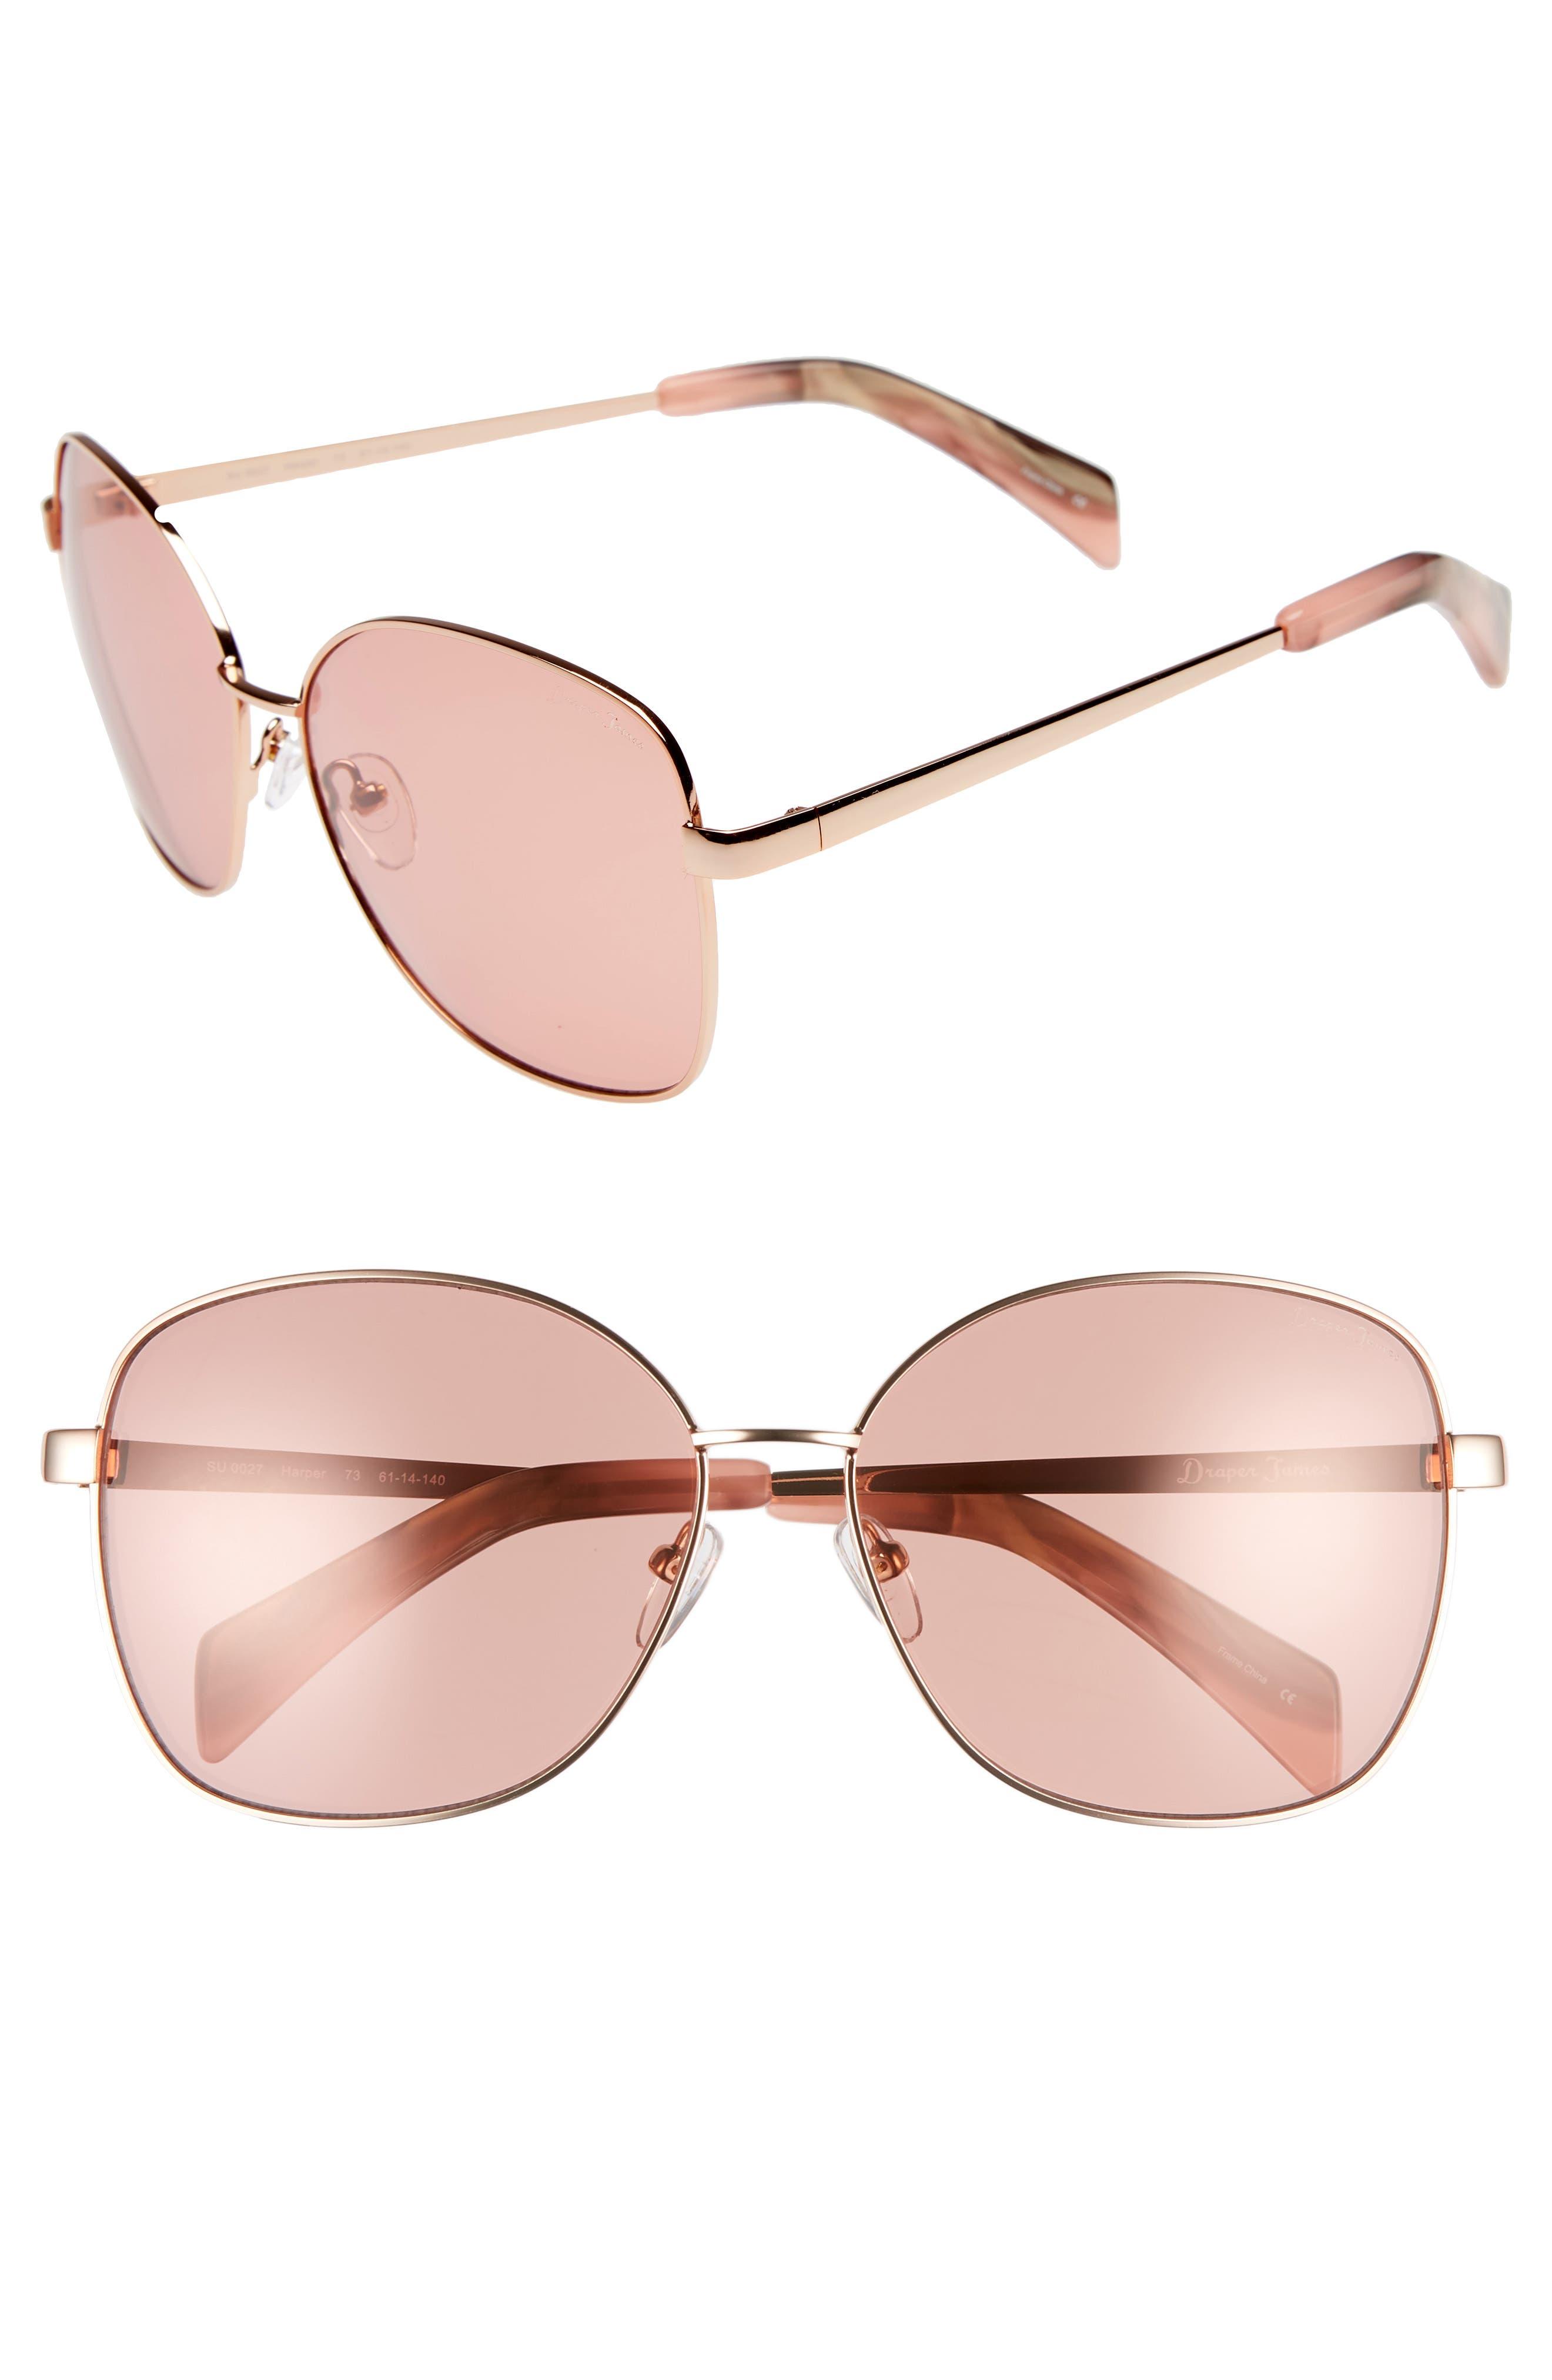 DRAPER JAMES 61Mm Square Sunglasses - Rose Gold